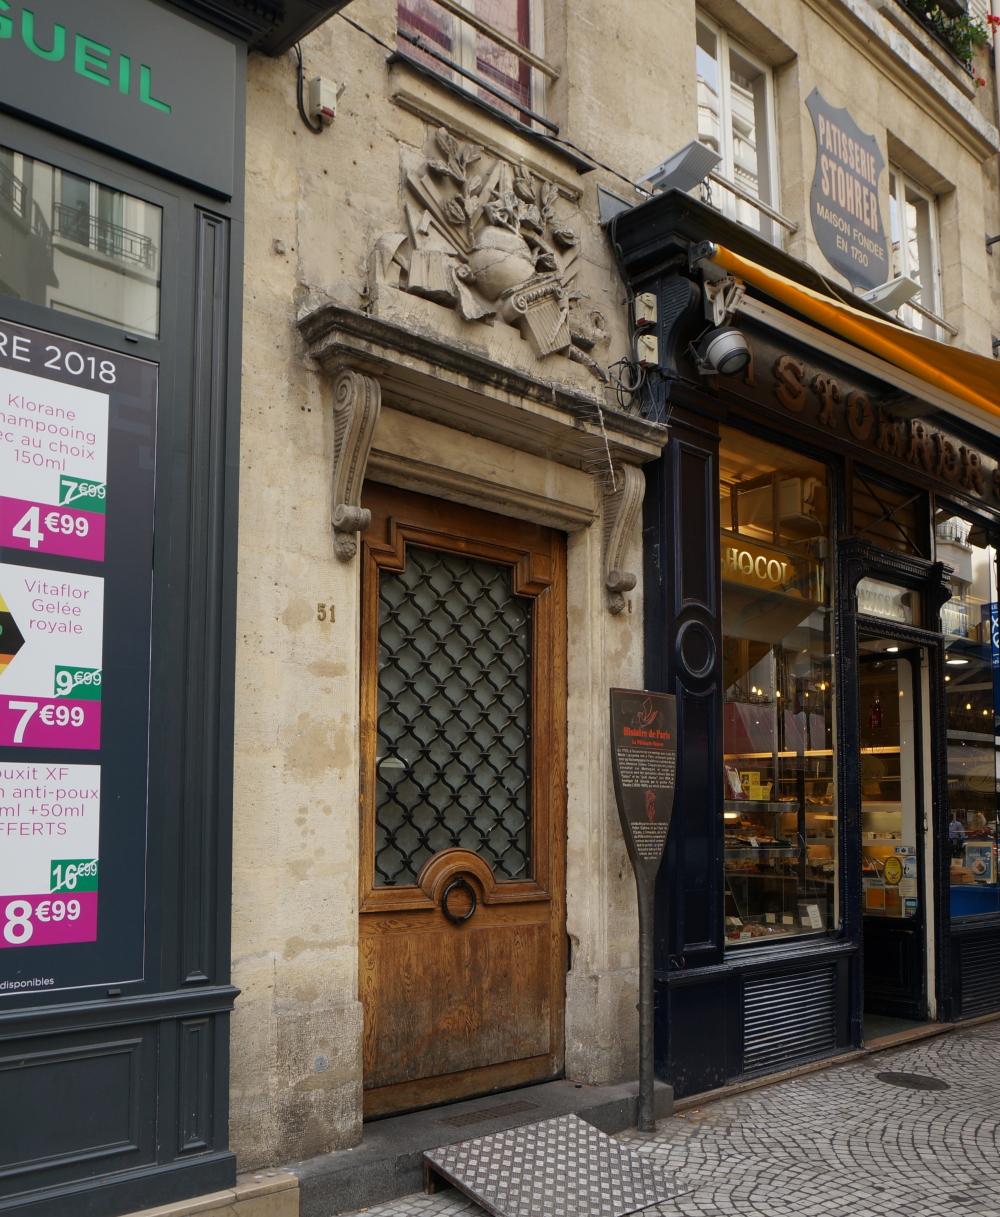 2018, ibidem.xyz ,51 rue Montorgueil,51, rue Montorgueil,Paris,France